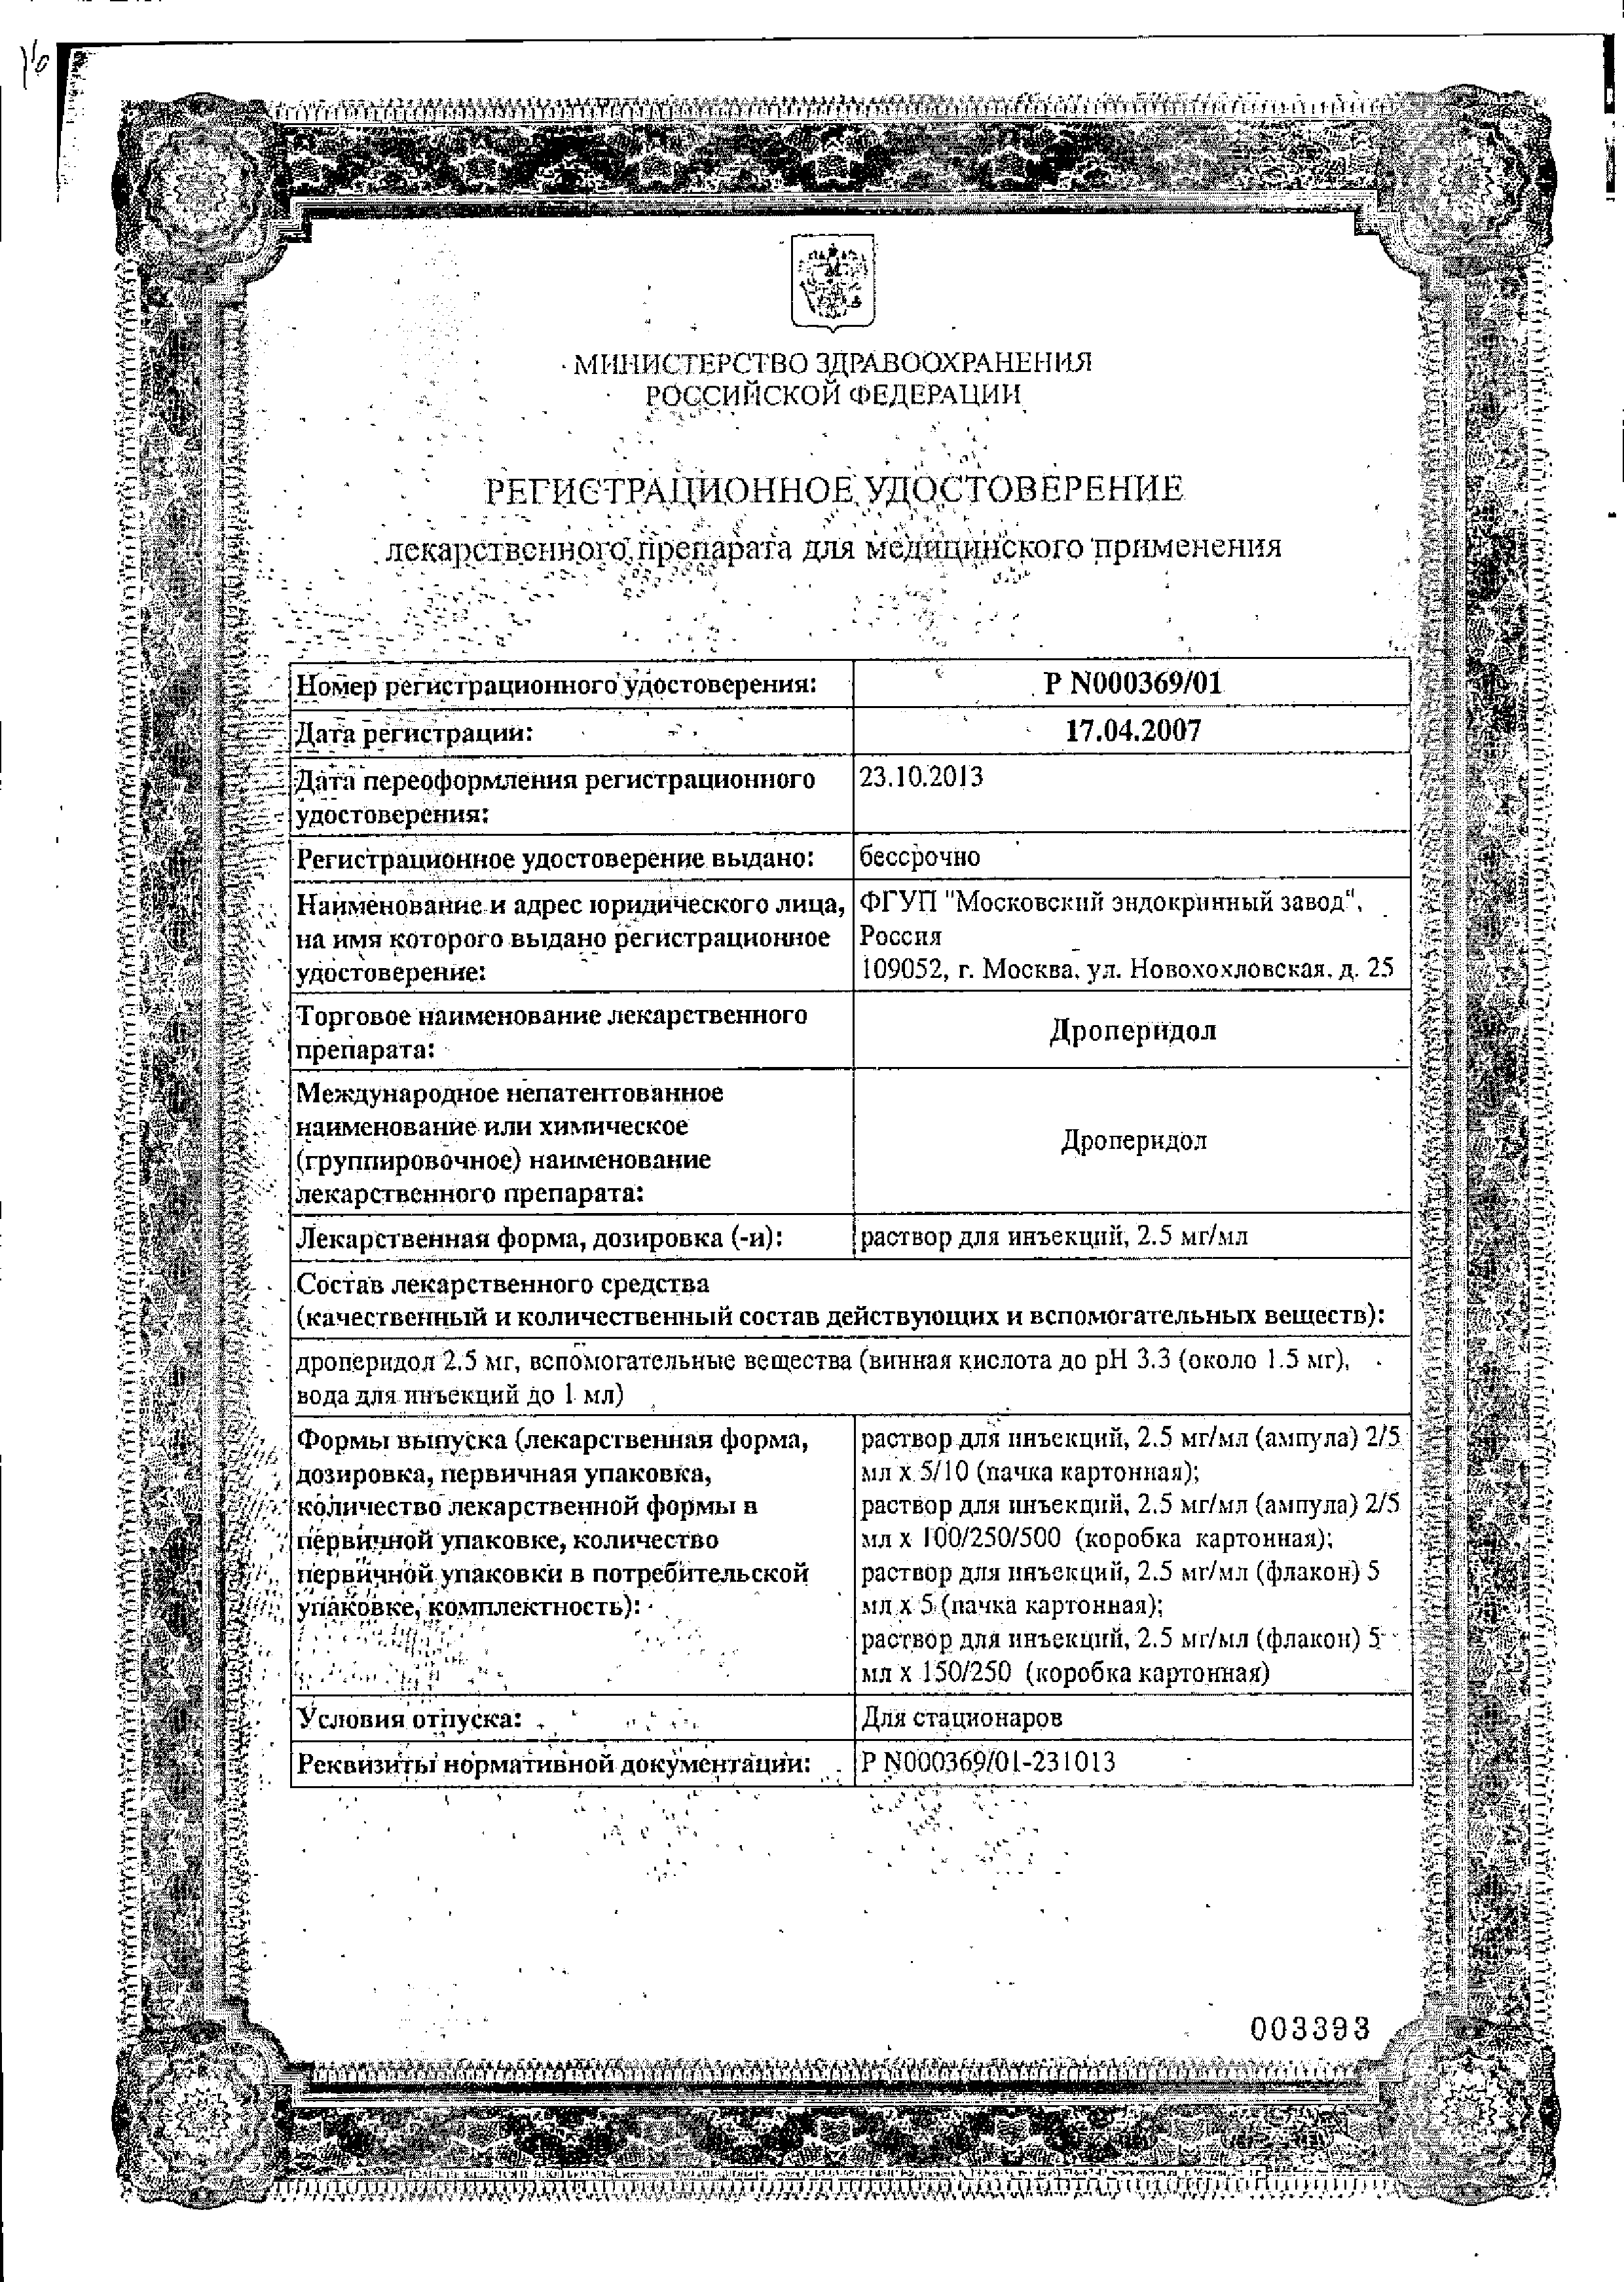 Дроперидол сертификат